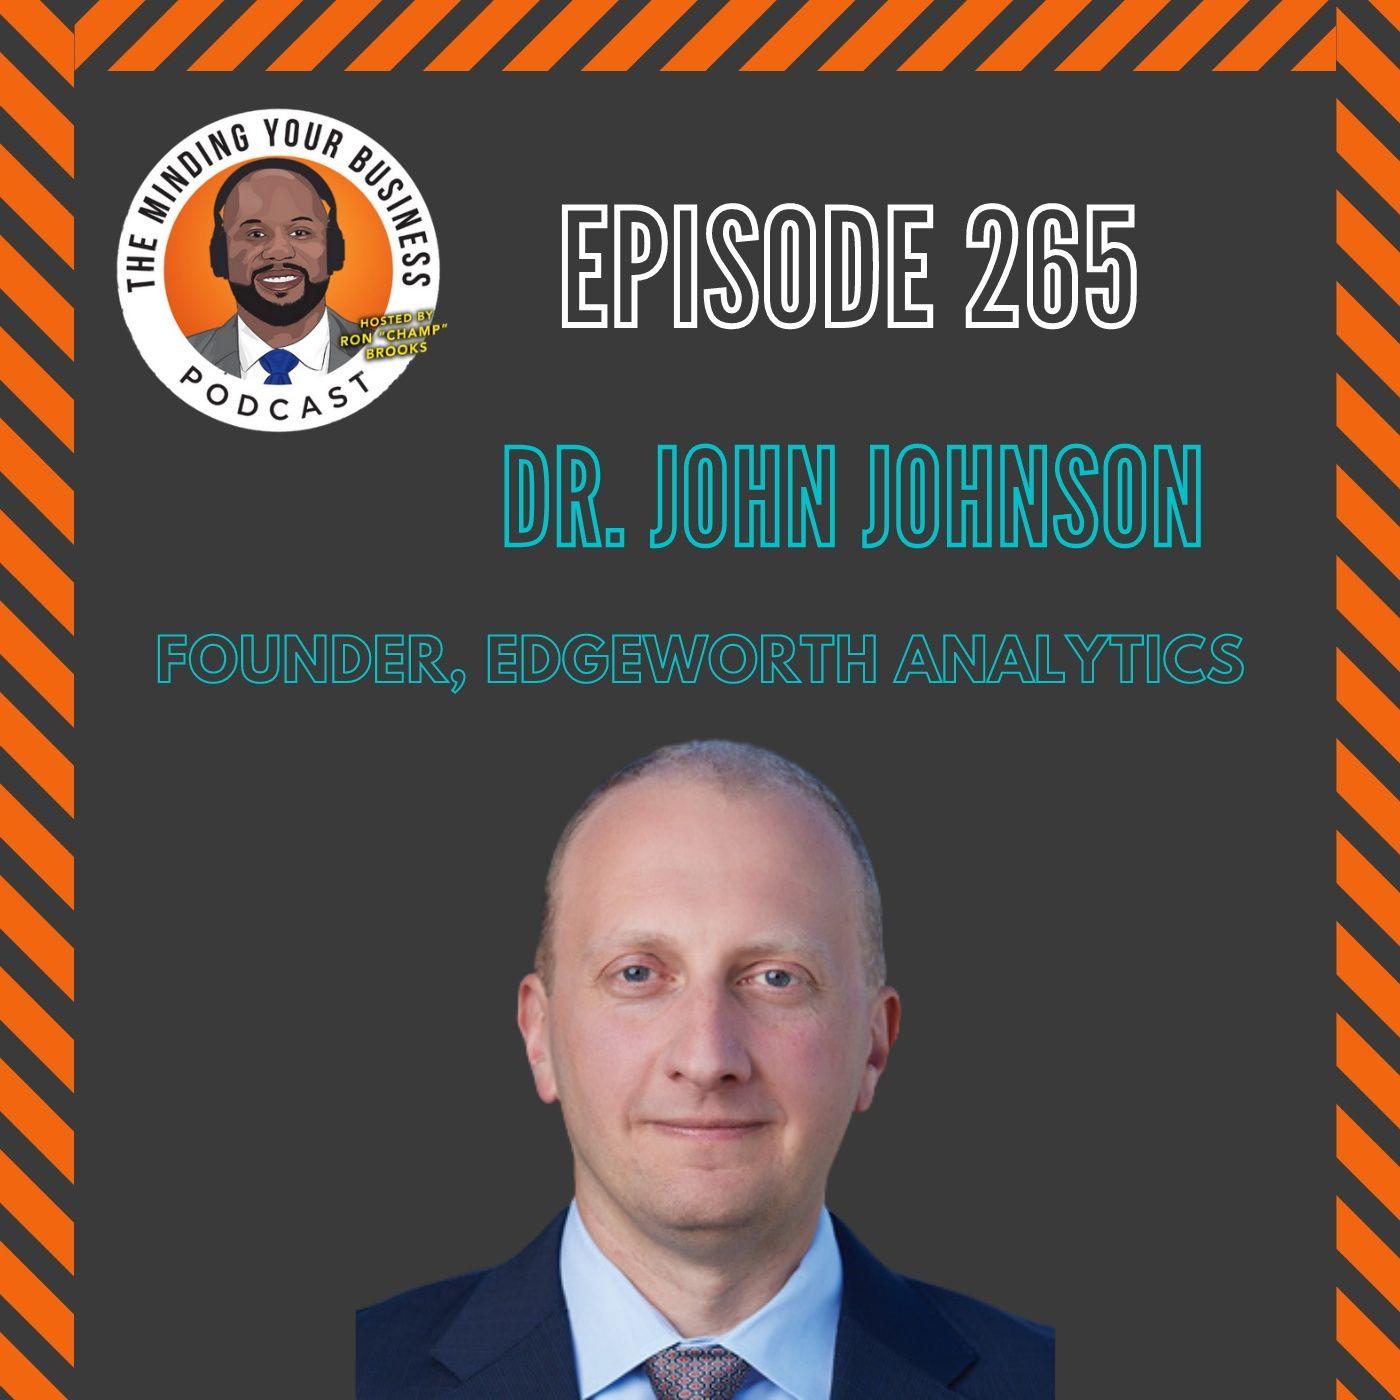 #265 - Dr. John Johnson, Founder of Edgeworth Analytics